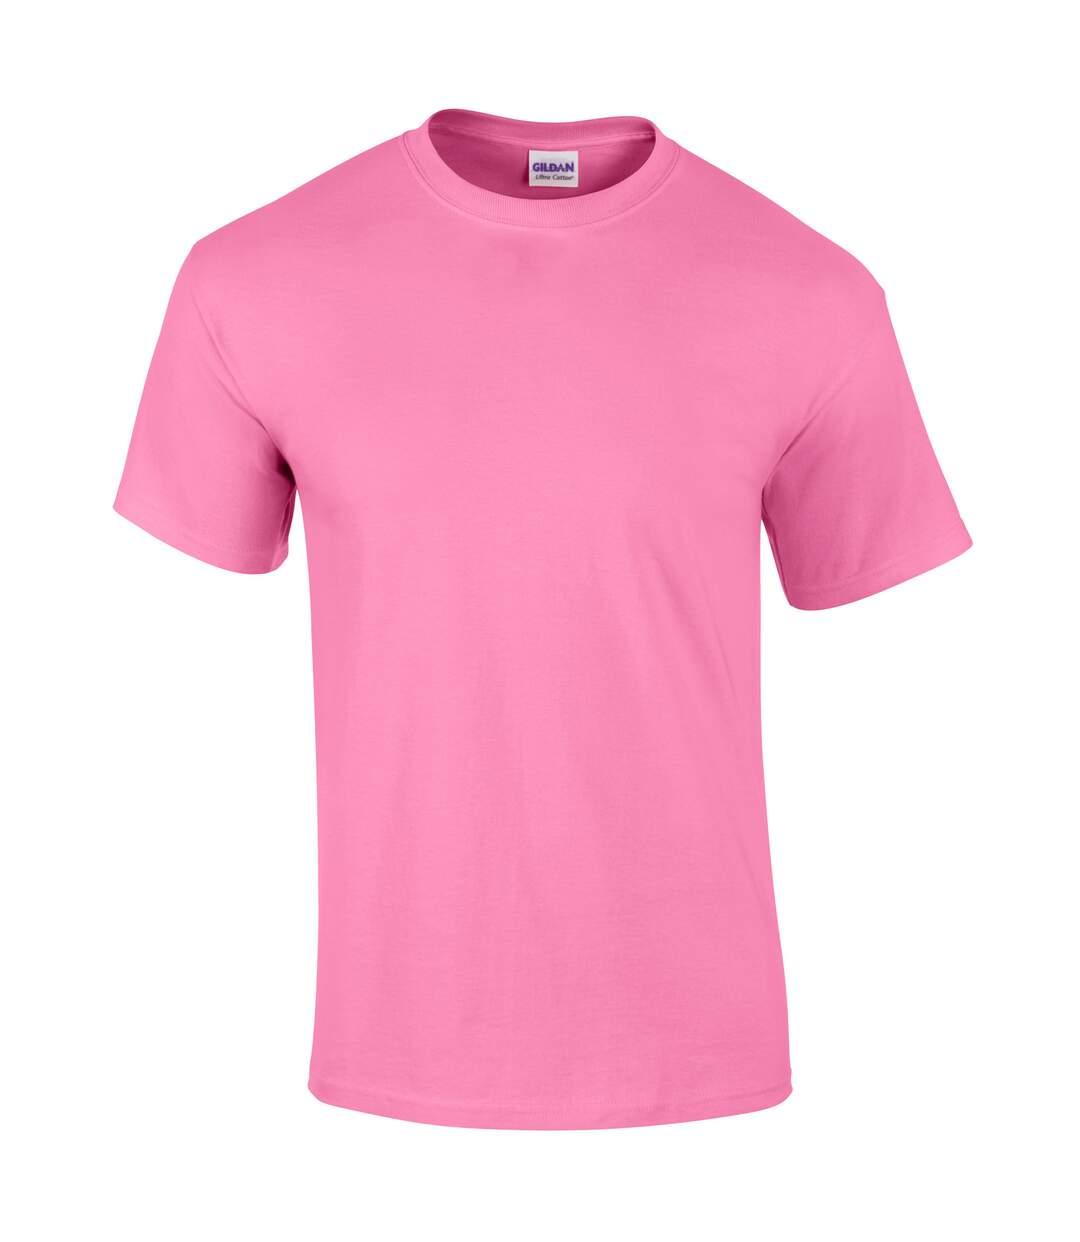 Gildan Mens Ultra Cotton Short Sleeve T-Shirt (Ash Grey) - UTBC475